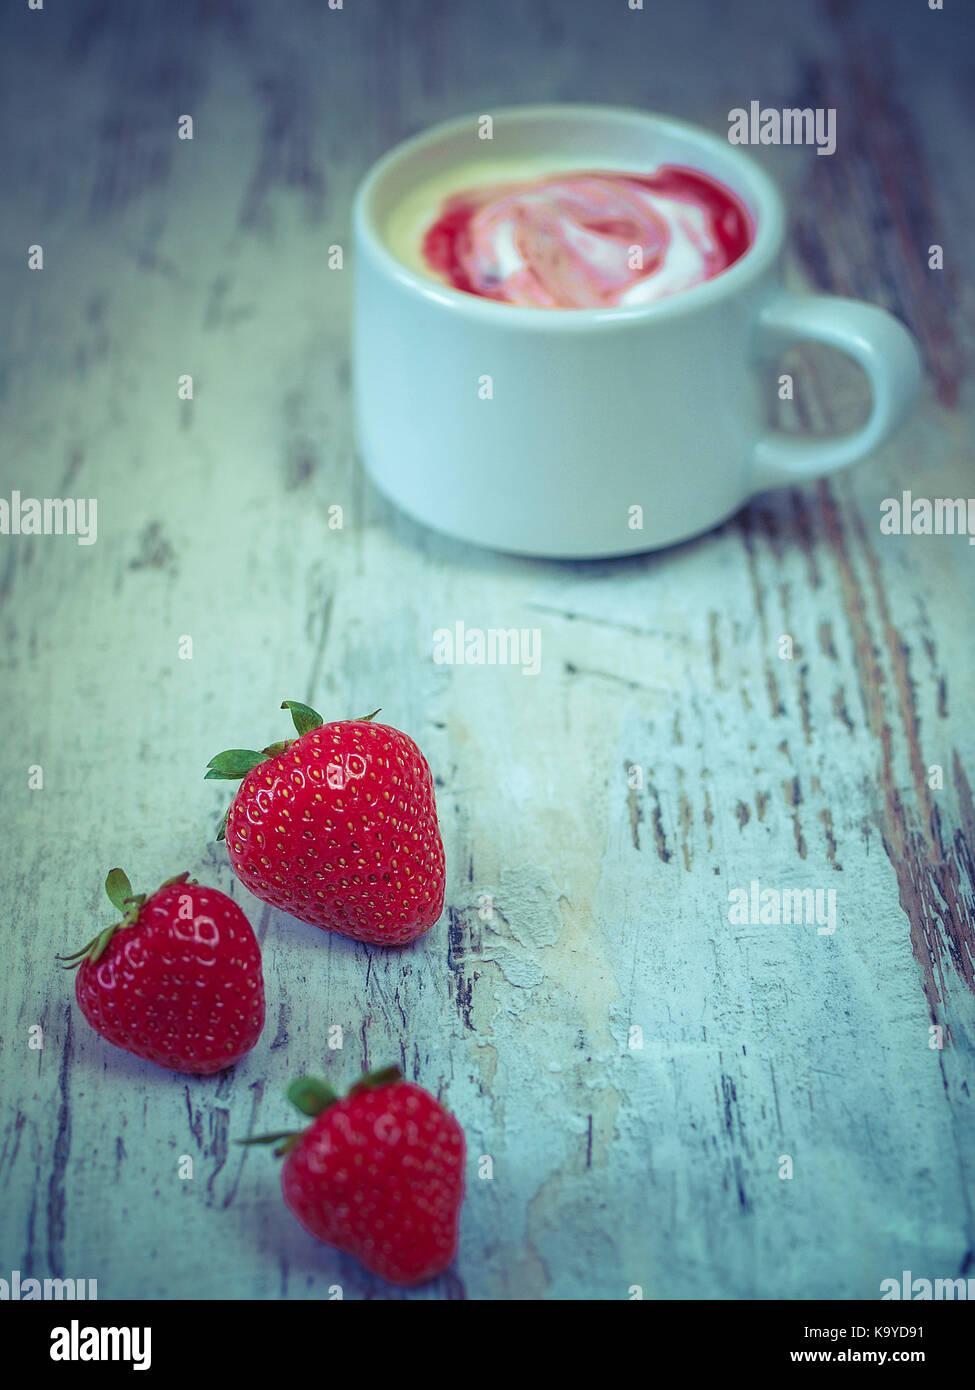 Yaourt fraise Photo Stock